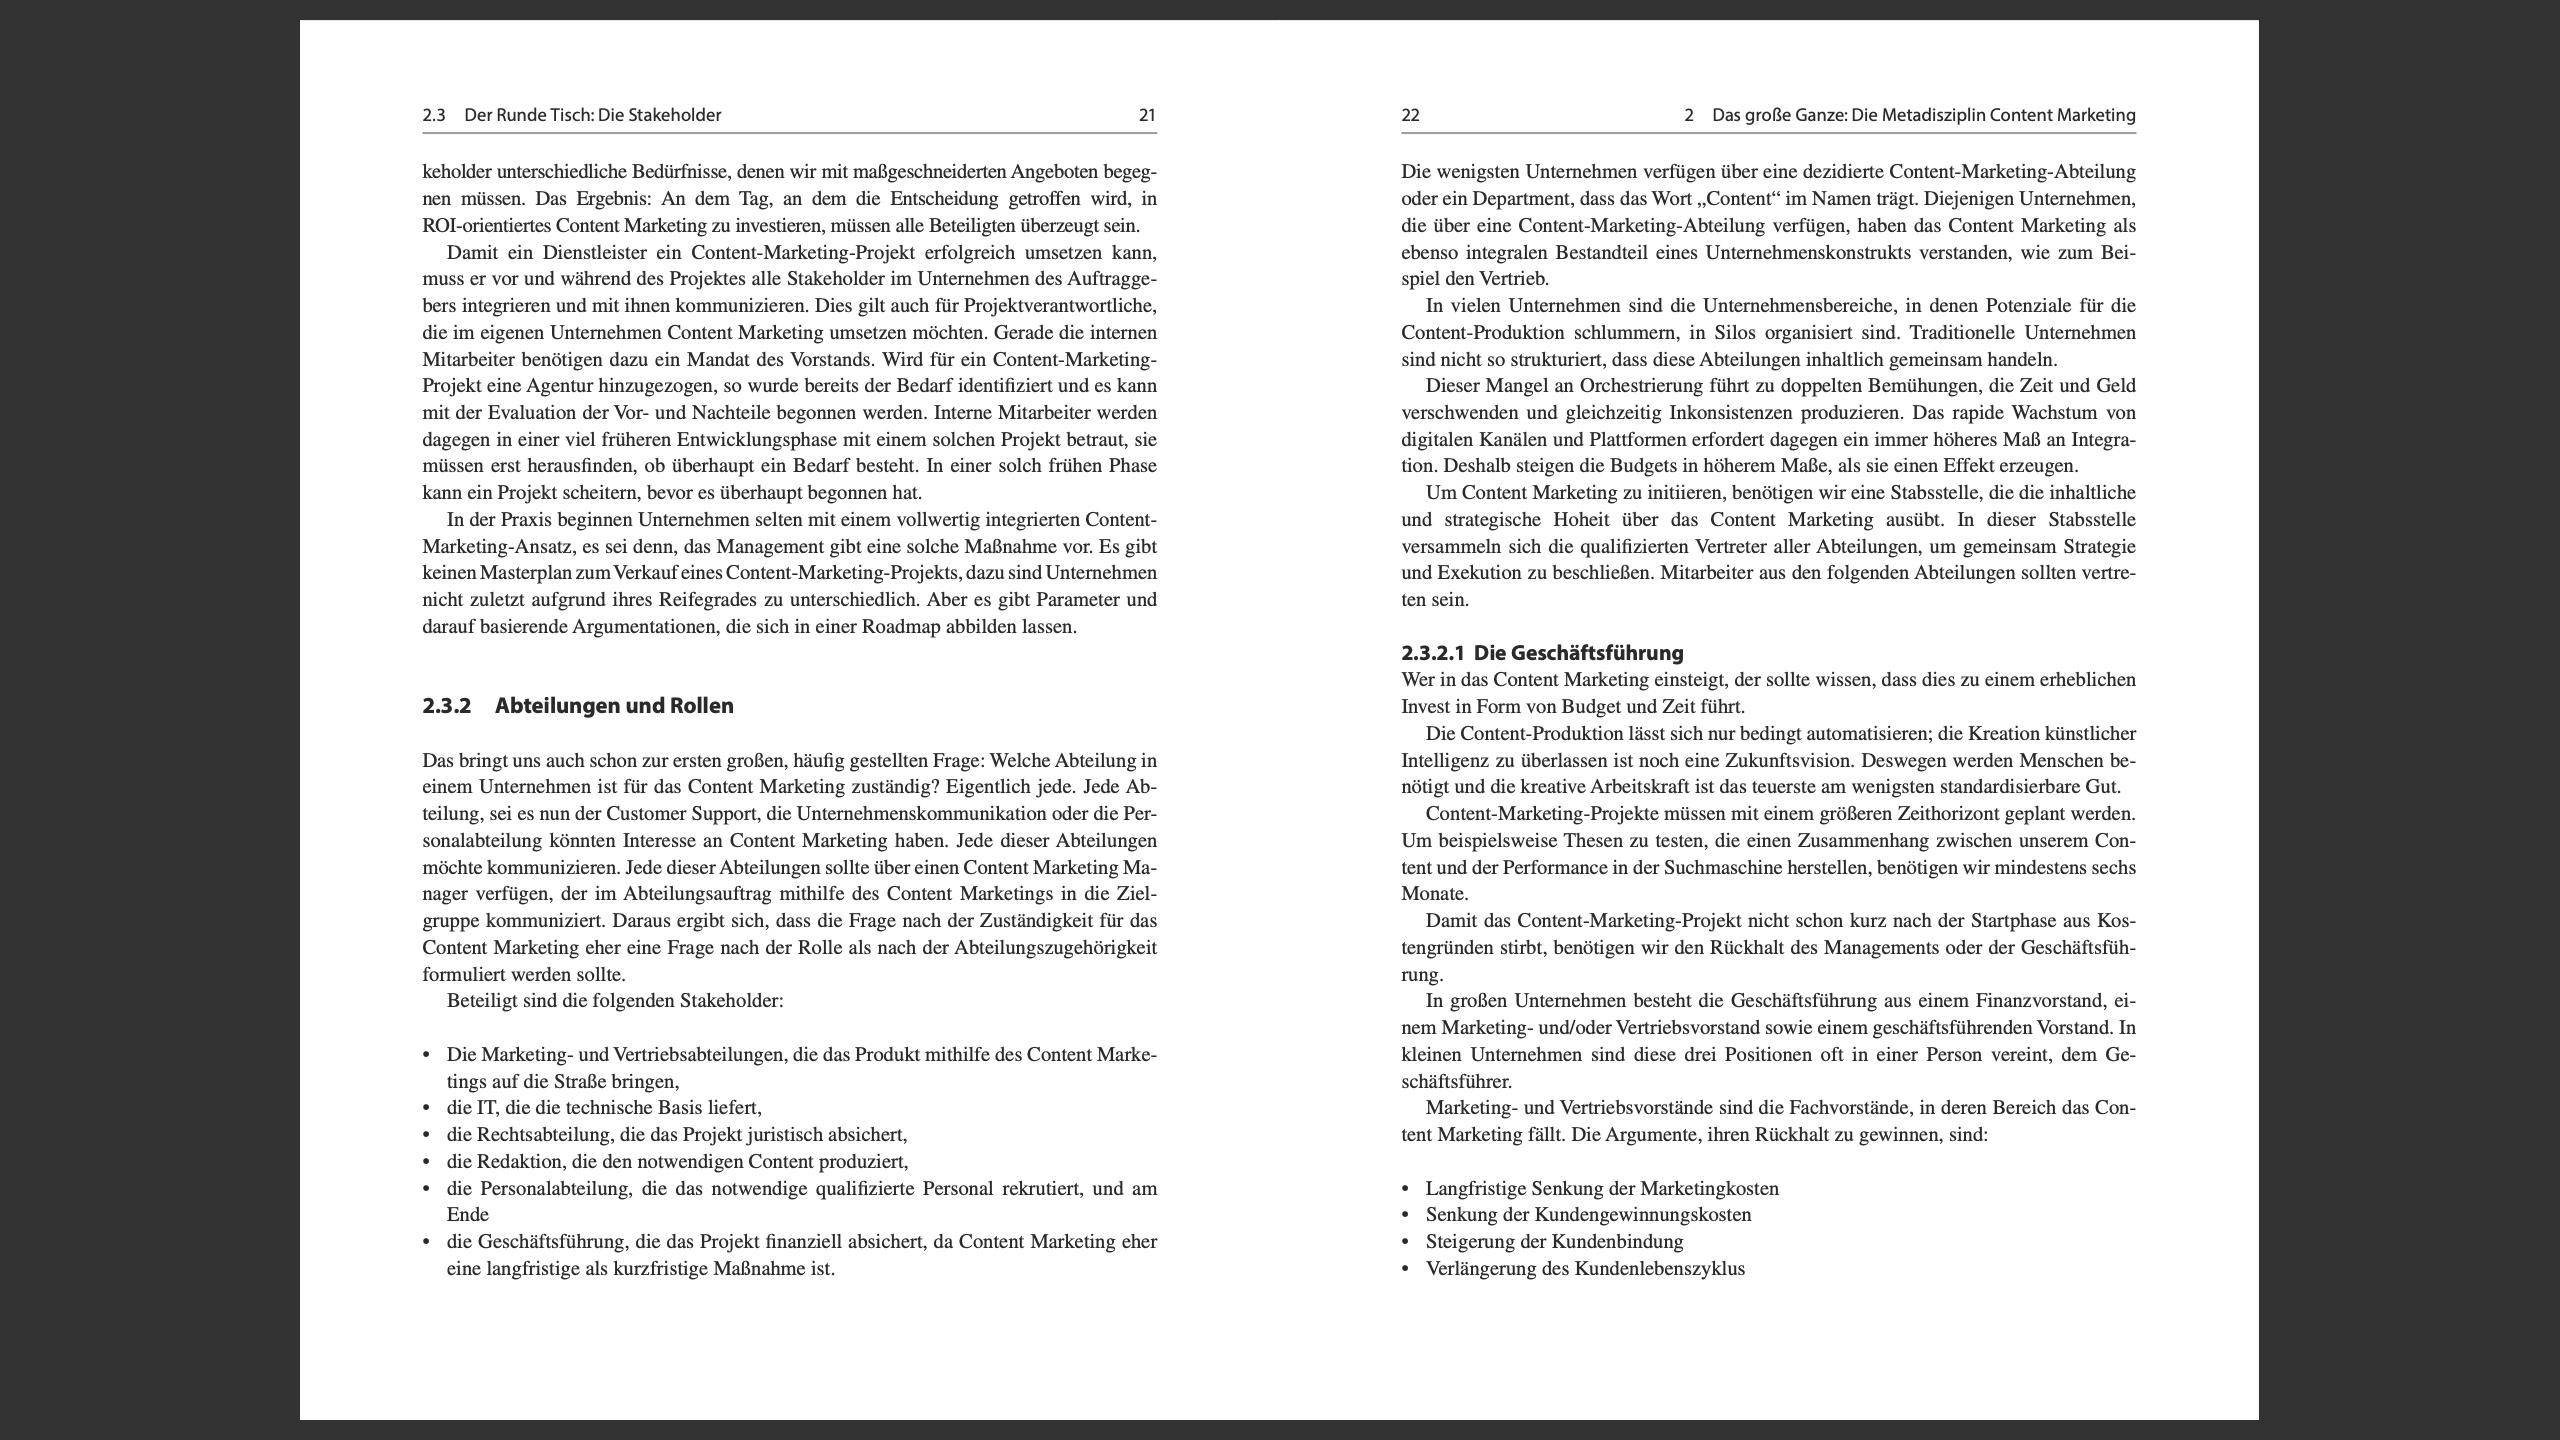 5-Methodisches-Content-Marketing-Gerrit-Grunert